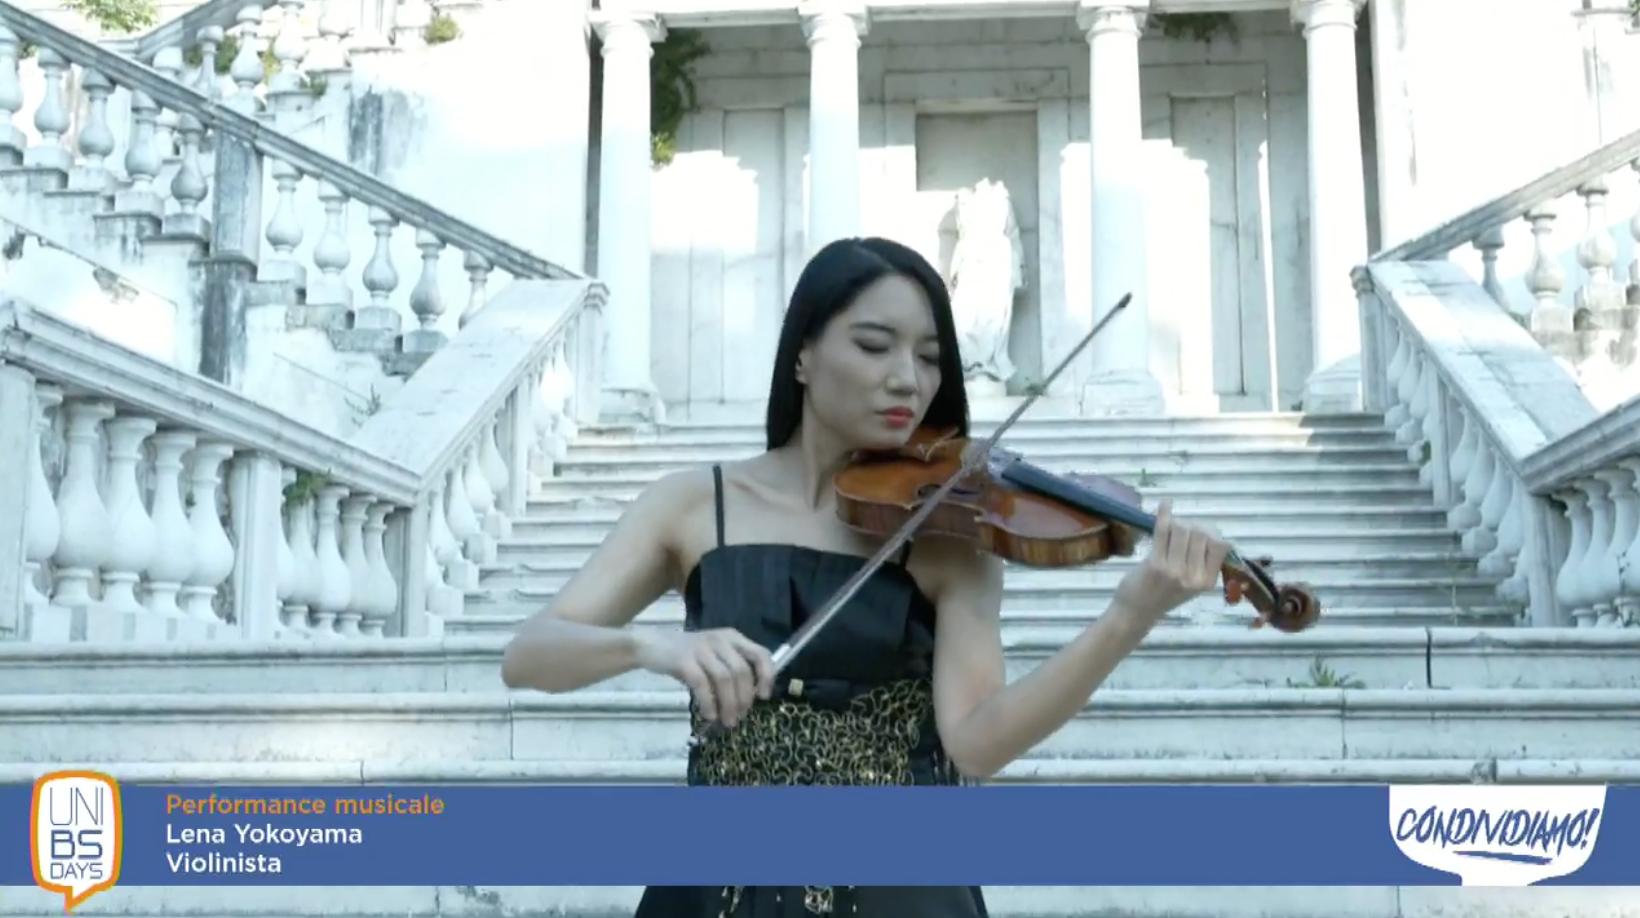 Lena Yokoyama, violinista